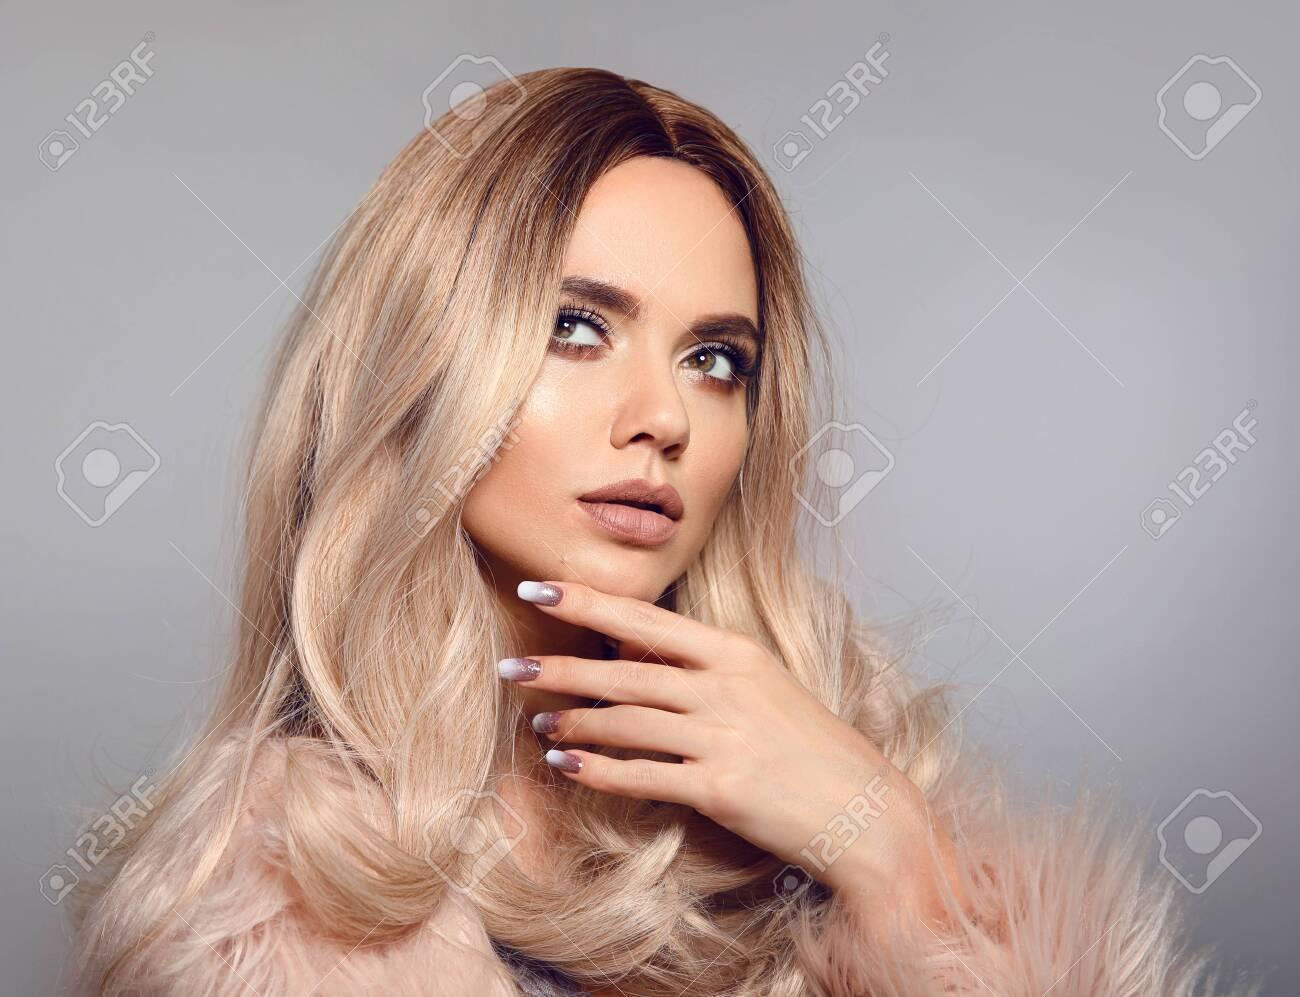 fe535f487 Blonde woman in glamorous fur coat posing in studio. Ombre blond..